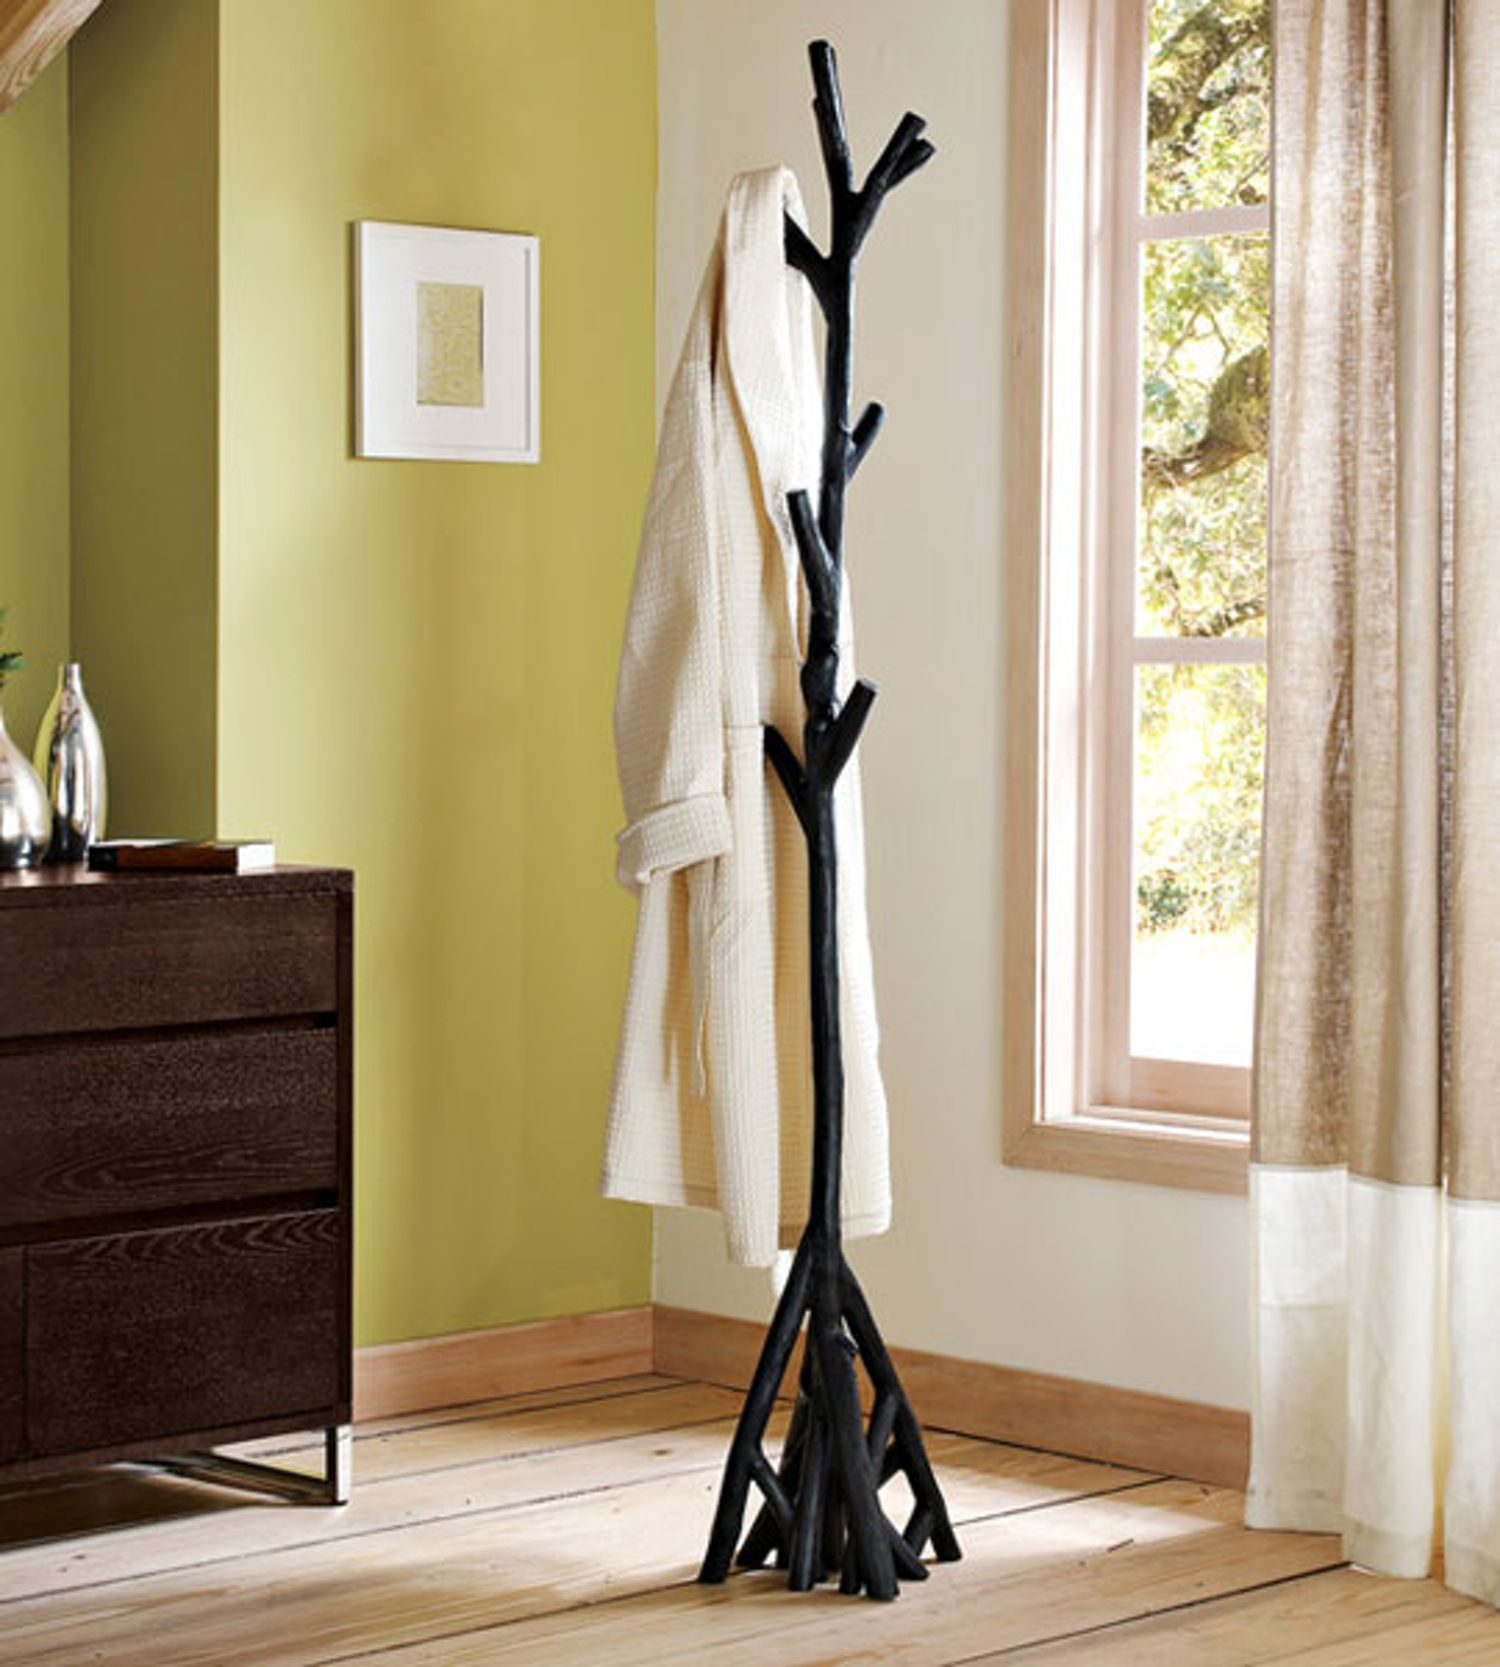 Tree Coat Rack from West Elm | Tree coat rack, Coat racks and ...